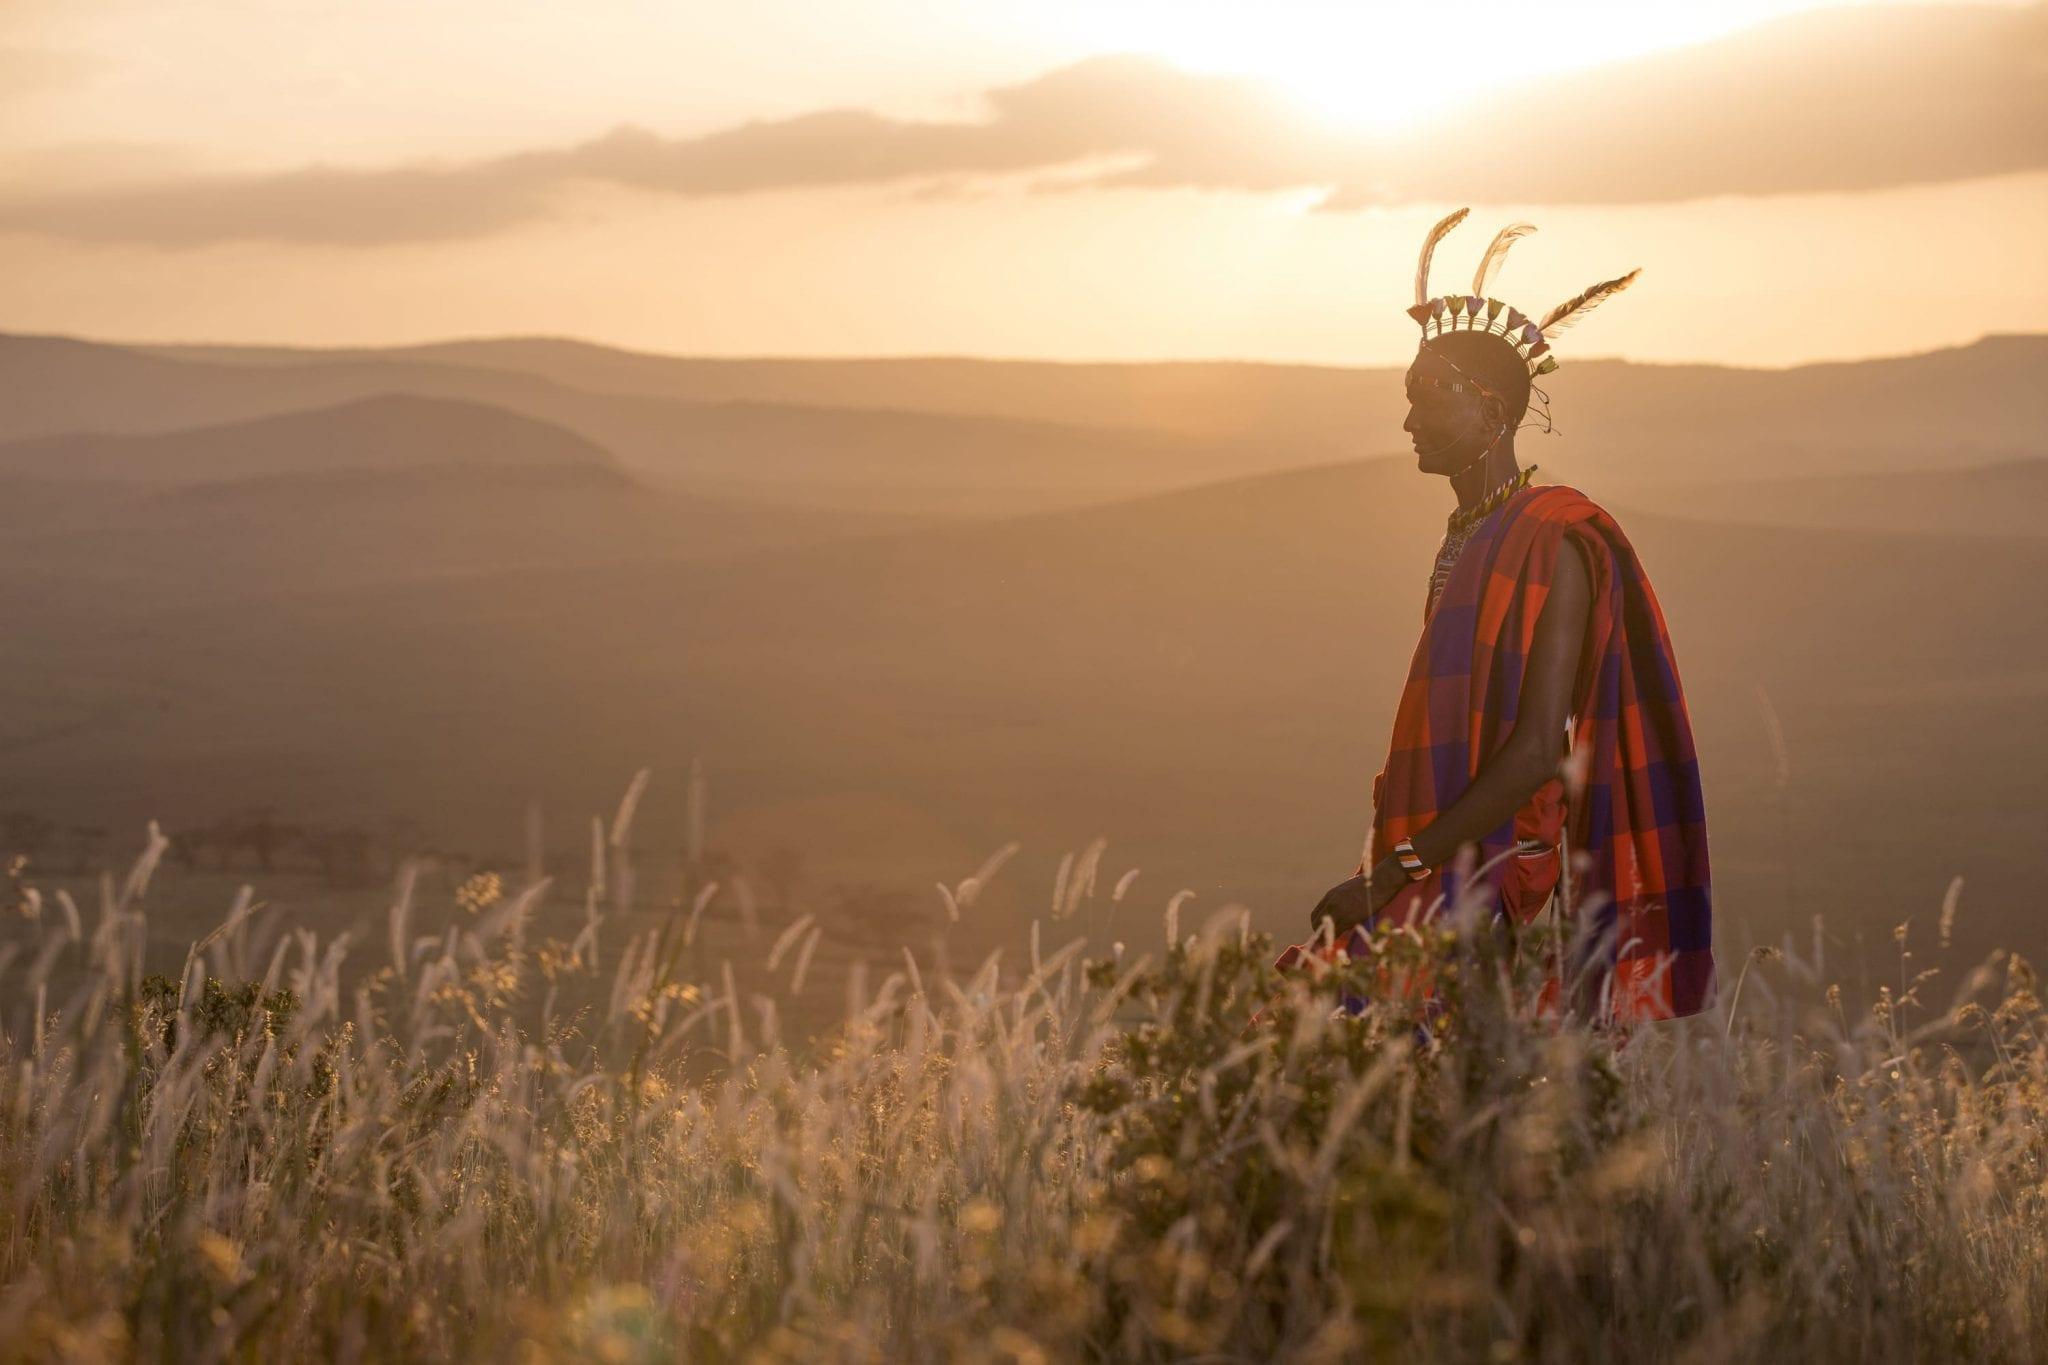 All Inclusive Luxury Kenya Yoga Safari Retreat, 1st – 6th December